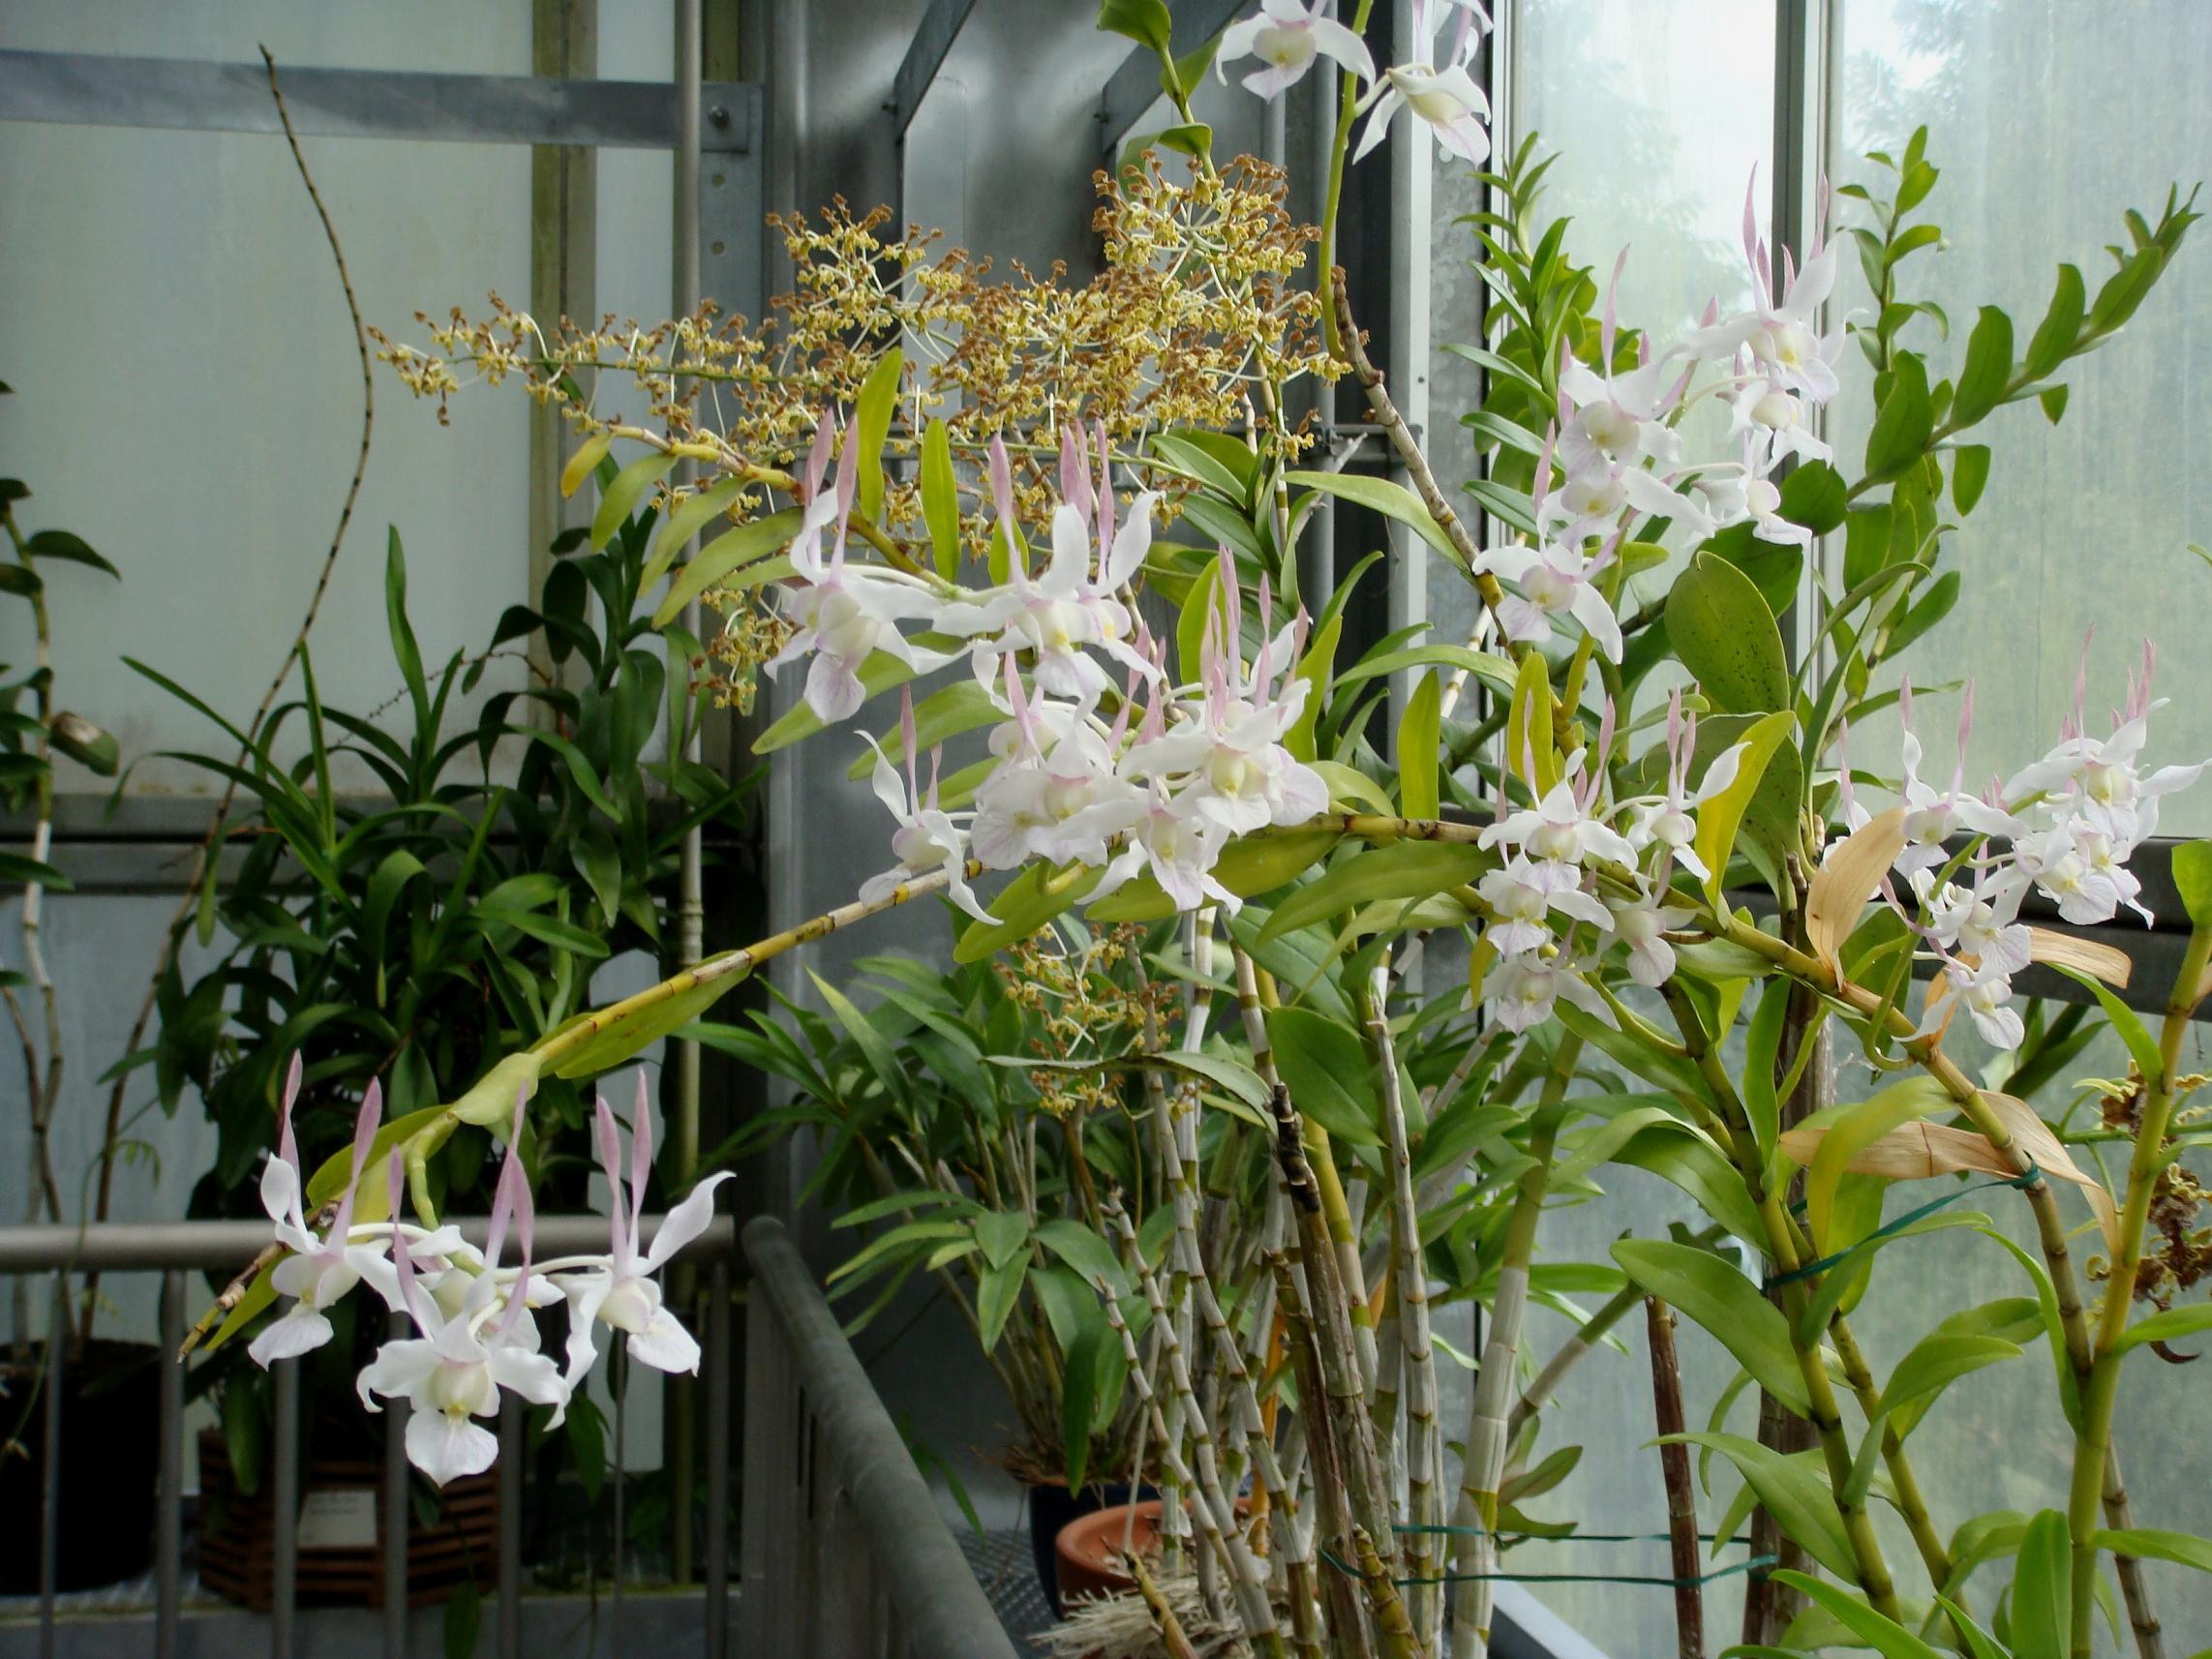 http://orchids.la.coocan.jp/Dendrobium/Dendrobium%20leporinum/DSC05144.JPG